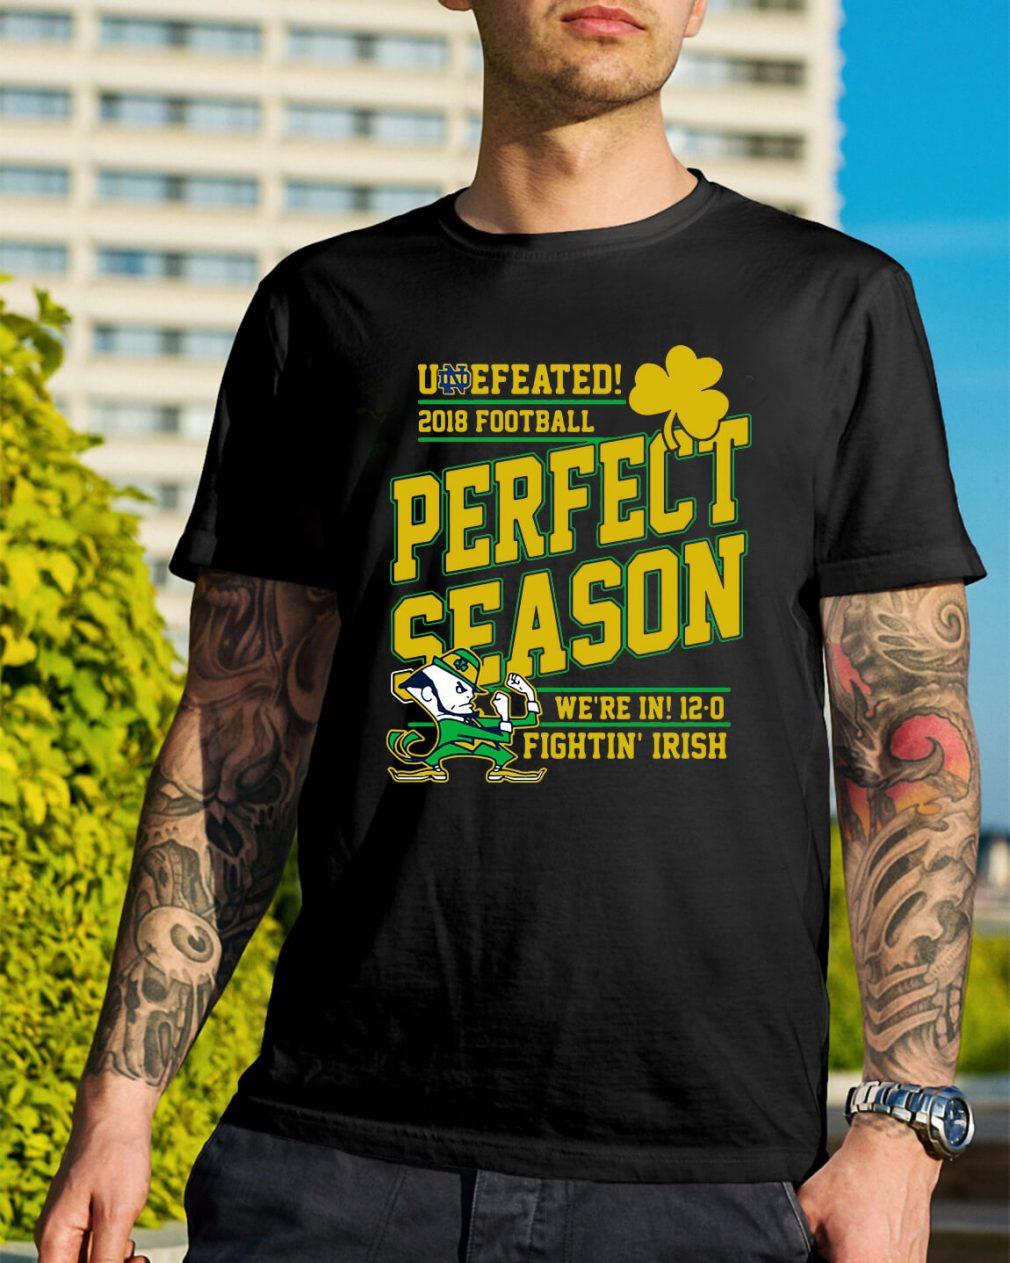 Undefeated 2018 football perfect season we're in 12-0 fightin' Irish shirt